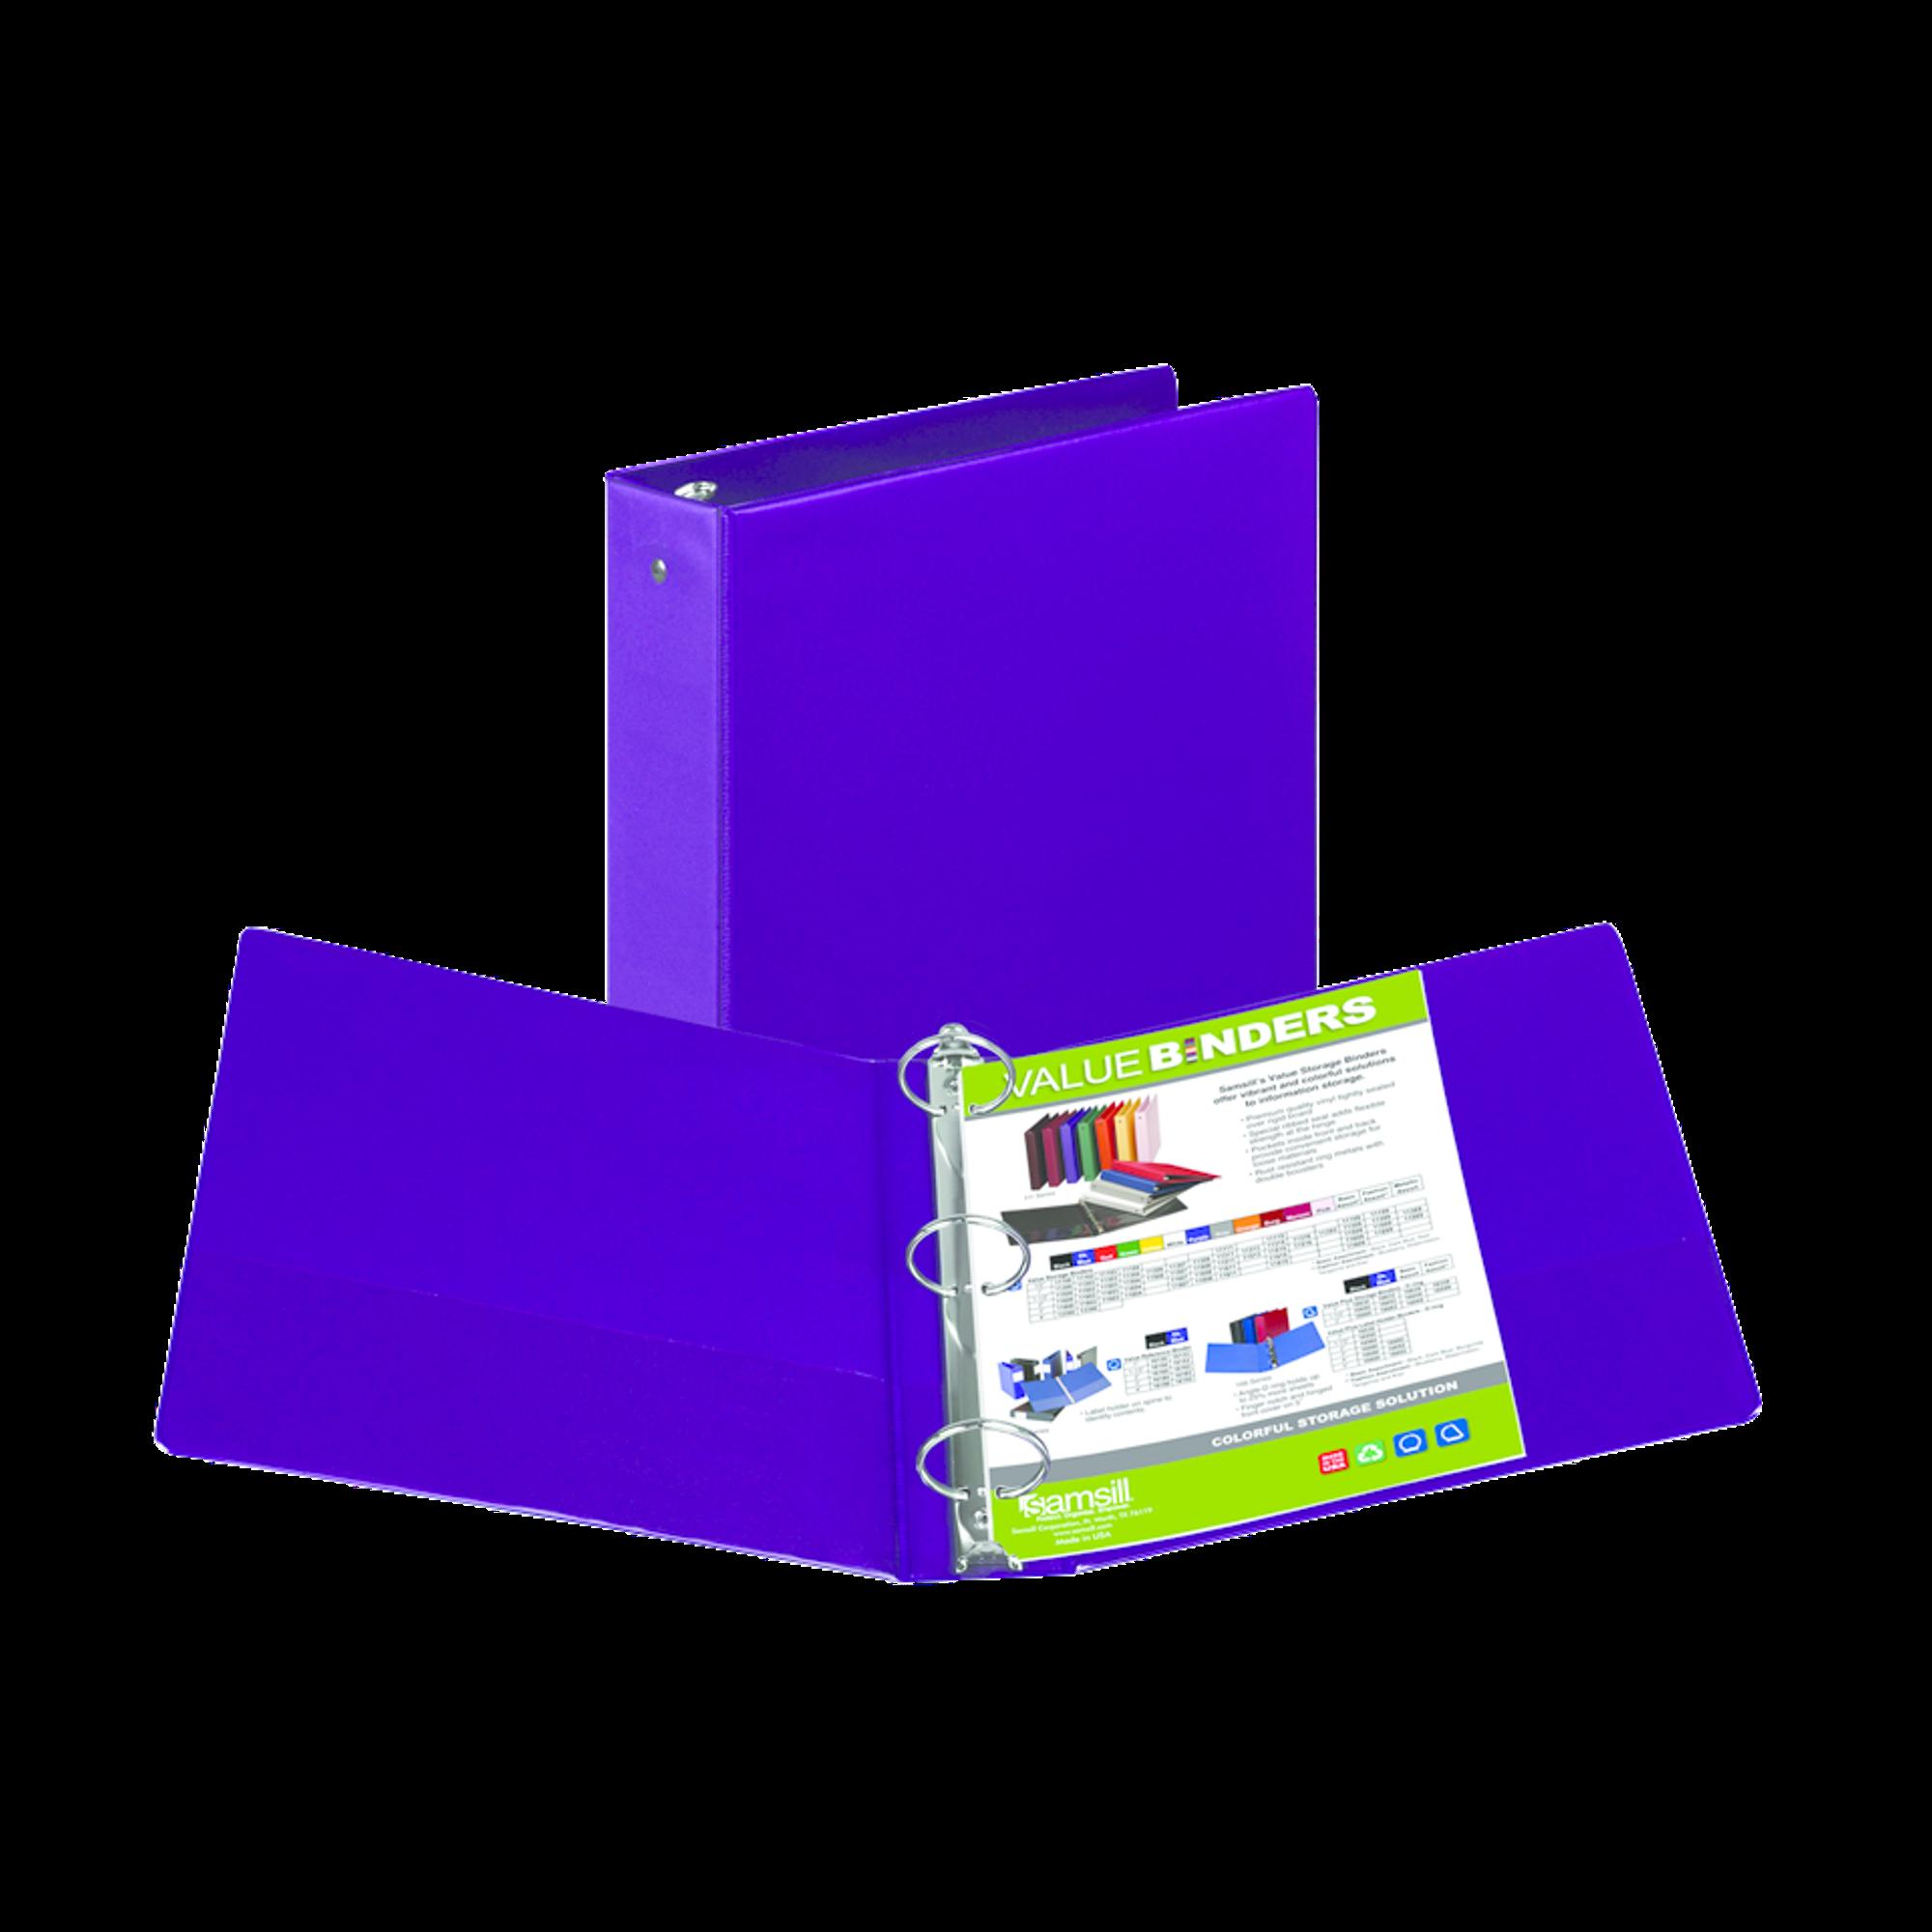 image of: Samsill Value Storage Pocket Binder - Purple 2in